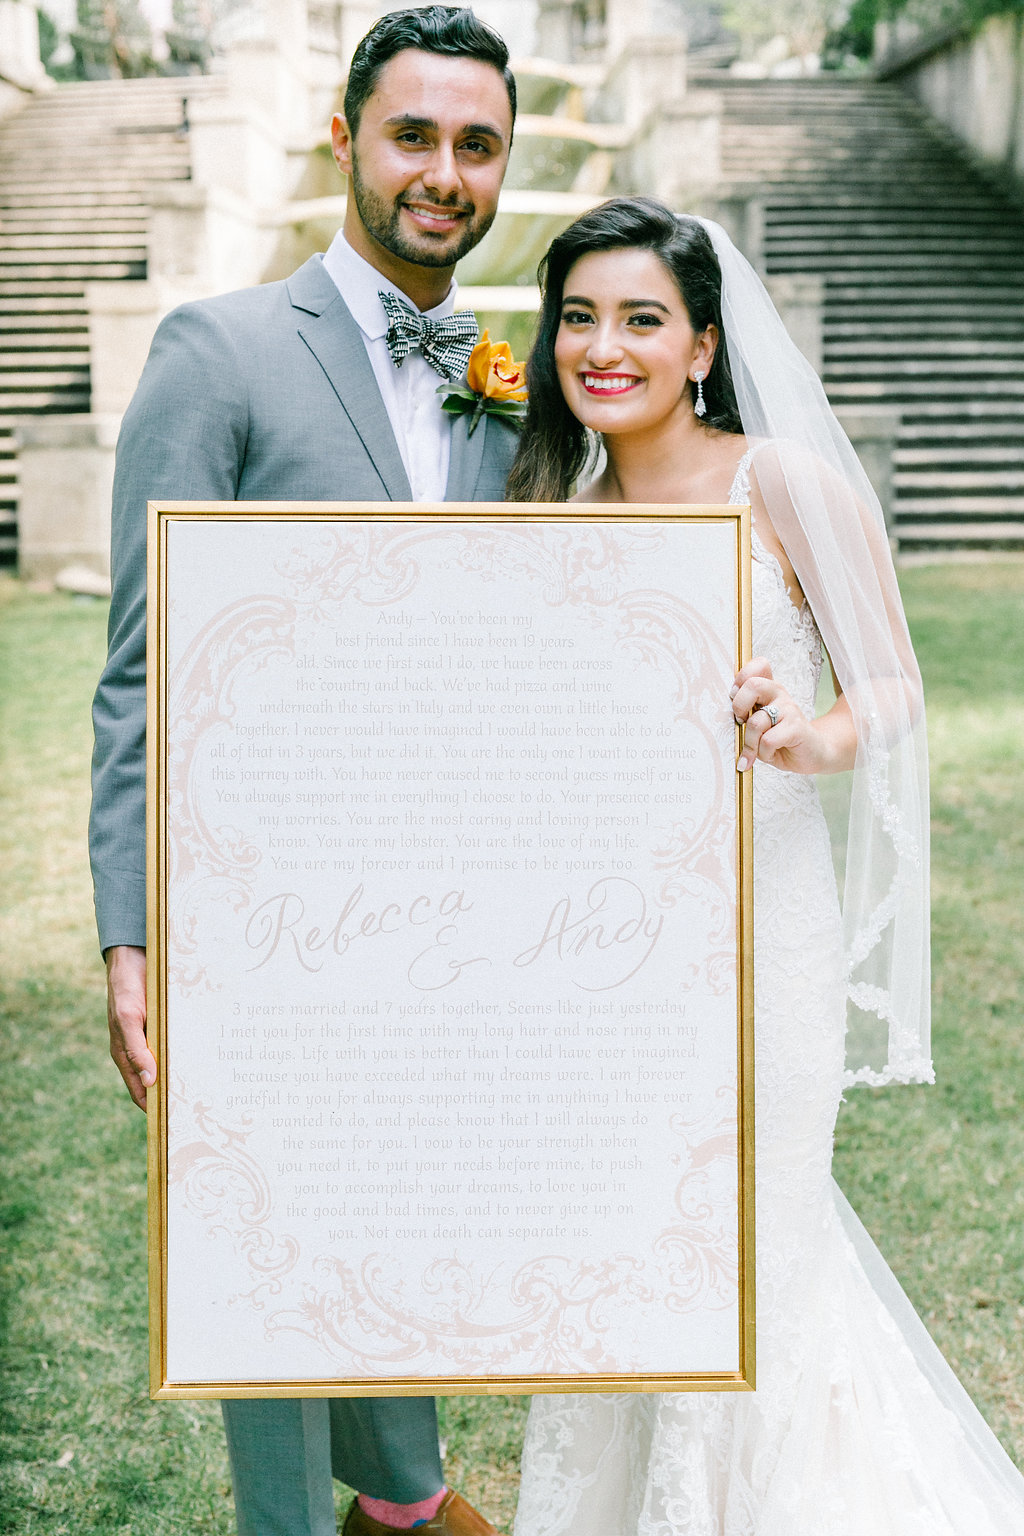 romantic wedding vow art - https://ruffledblog.com/vibrant-atlanta-wedding-inspiration-with-rust-accents